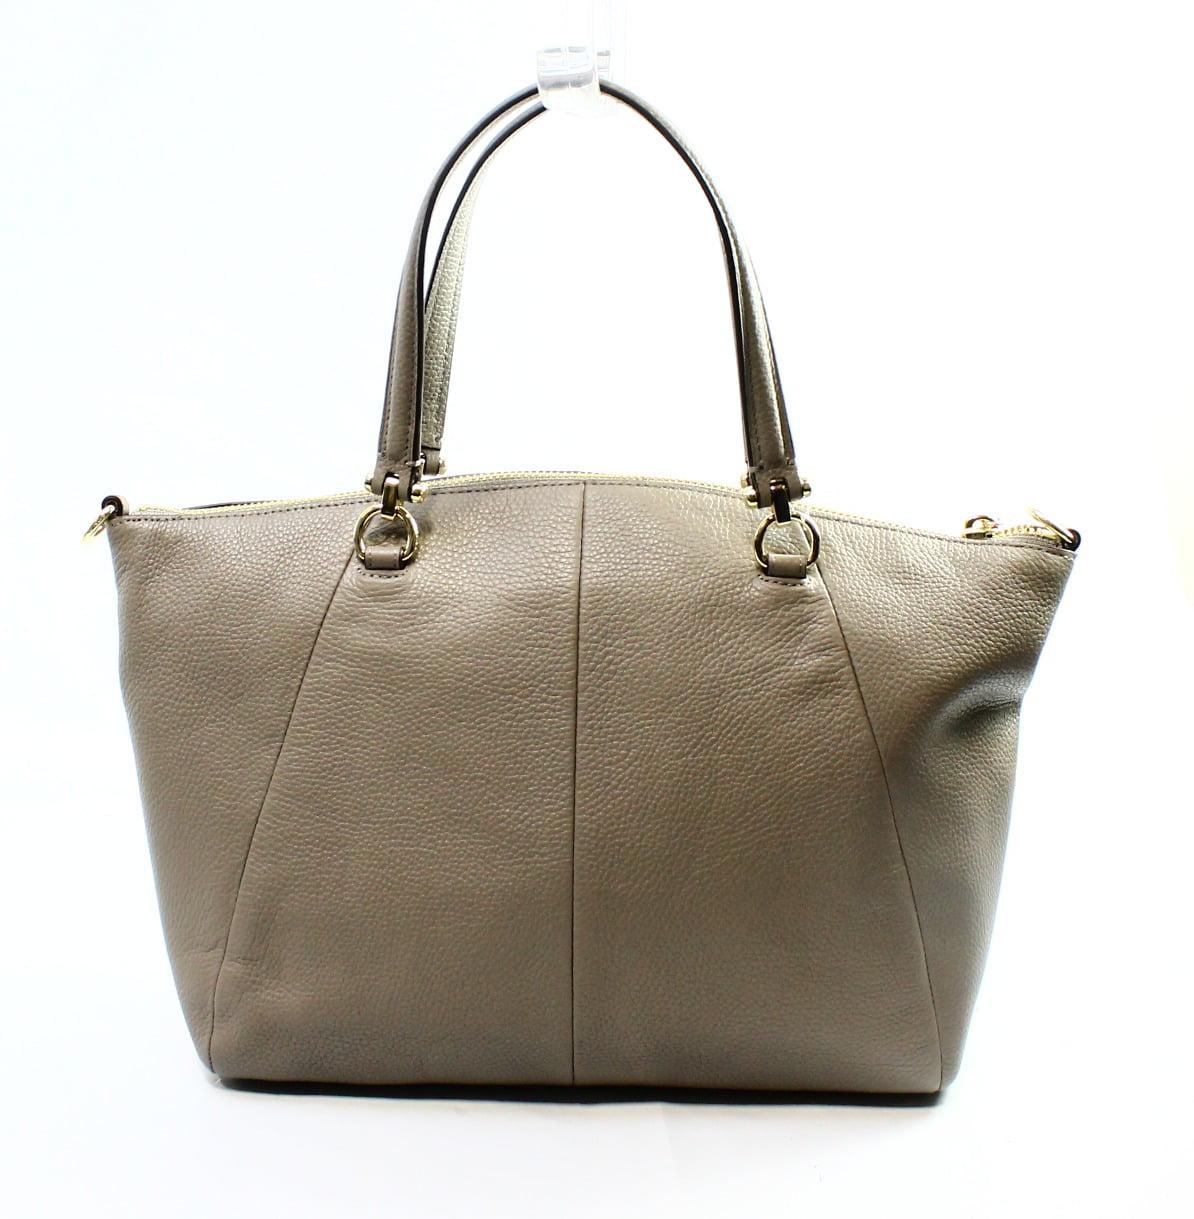 6adad4c63ca5 Coach - Coach NEW Gray Fog Gold Leather Zip Top Prairie Satchel Bag Purse   275- 061 - Walmart.com